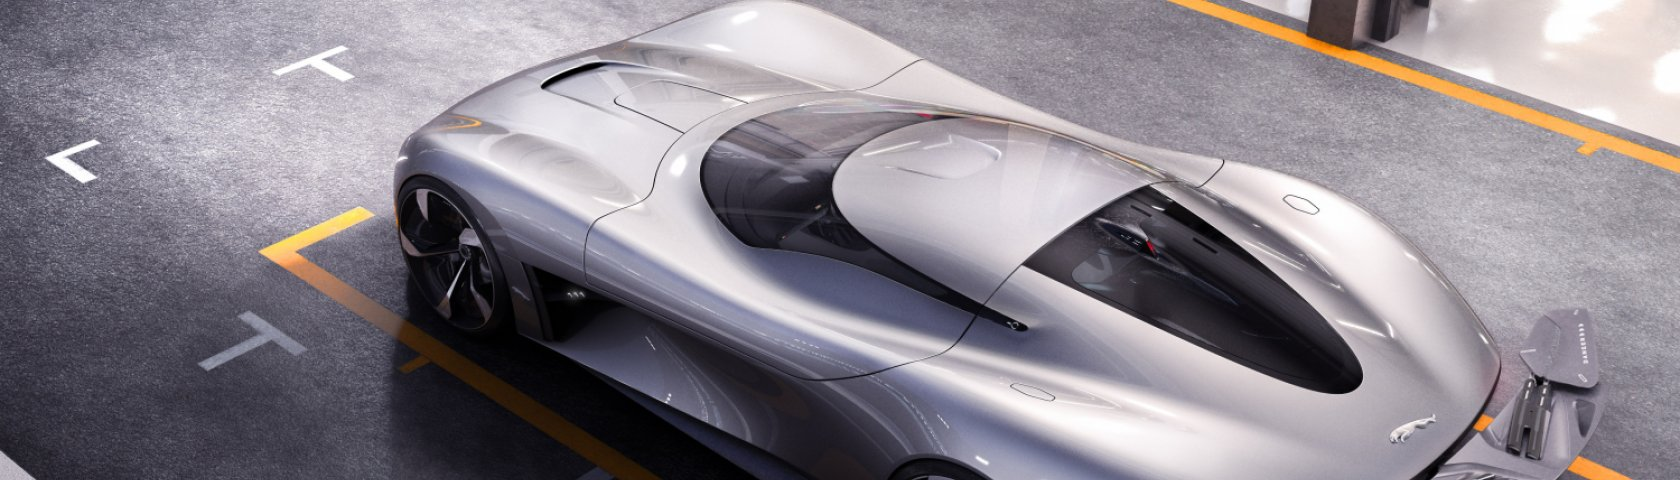 Jaguar Vision Gran Turismo Coupé Exterior 25 10 19 001